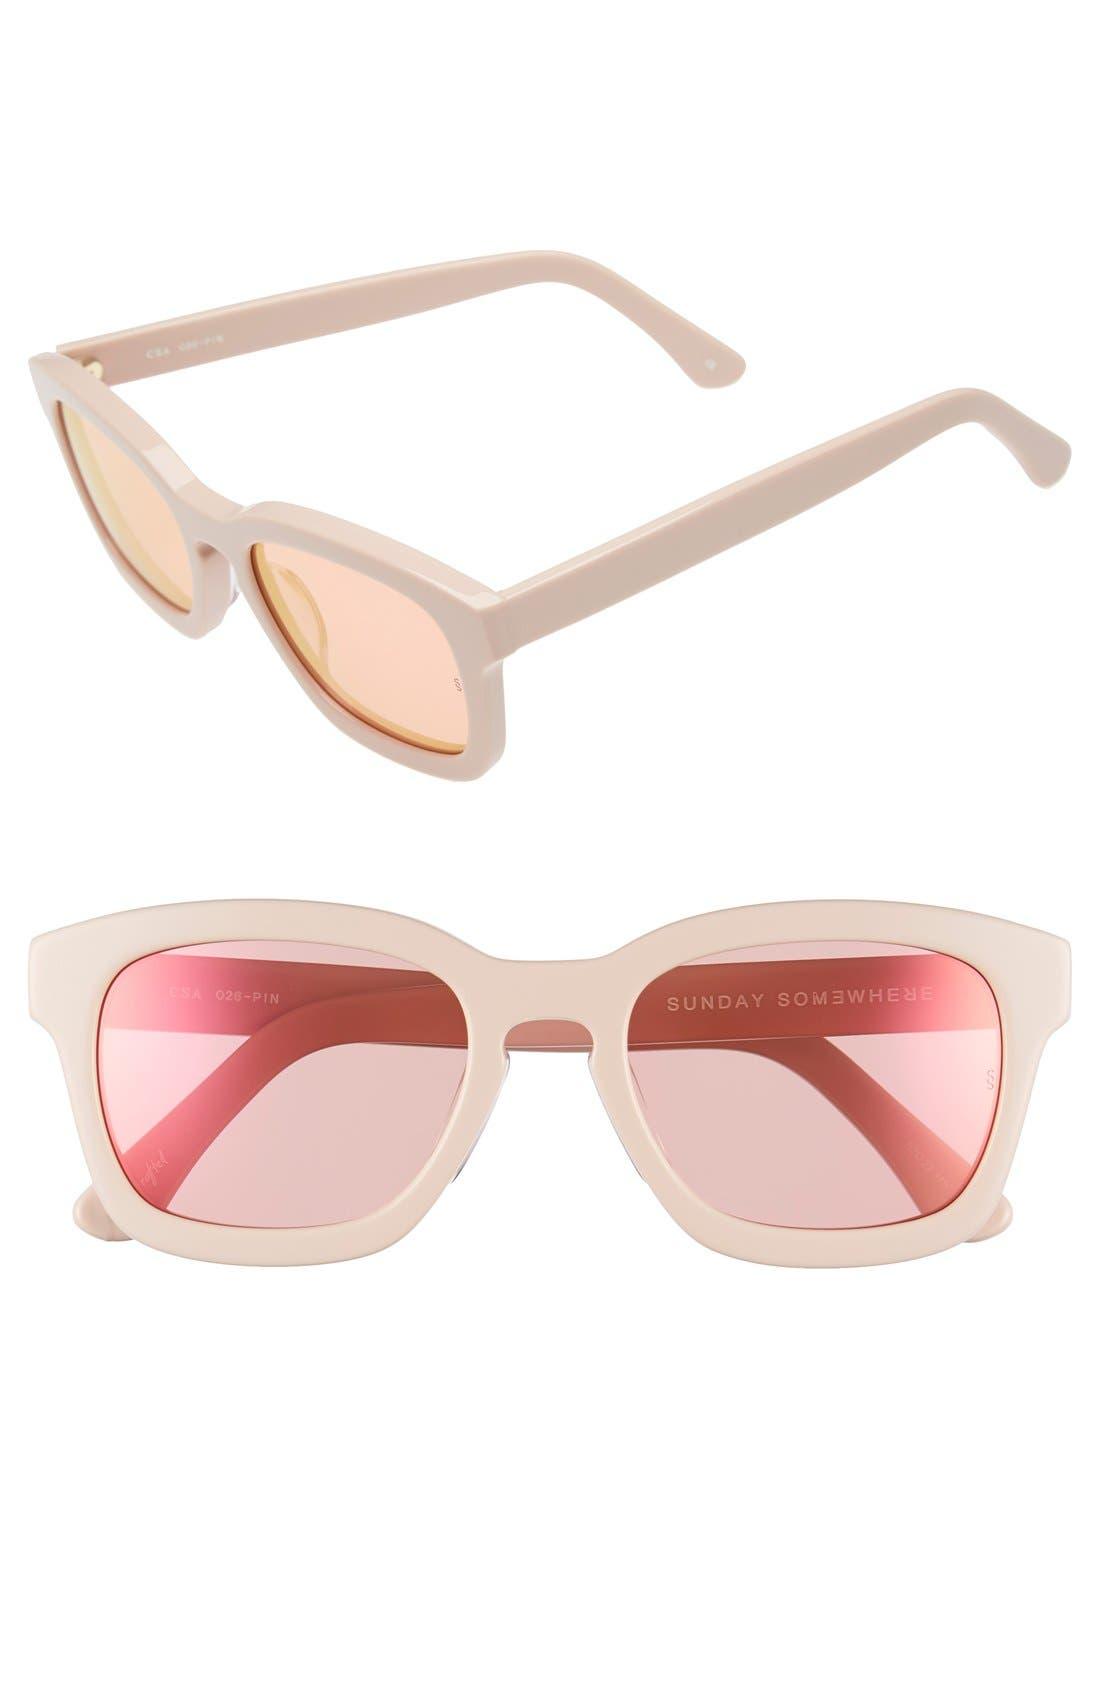 SUNDAY SOMEWHERE 'CSA' 52mm Retro Sunglasses